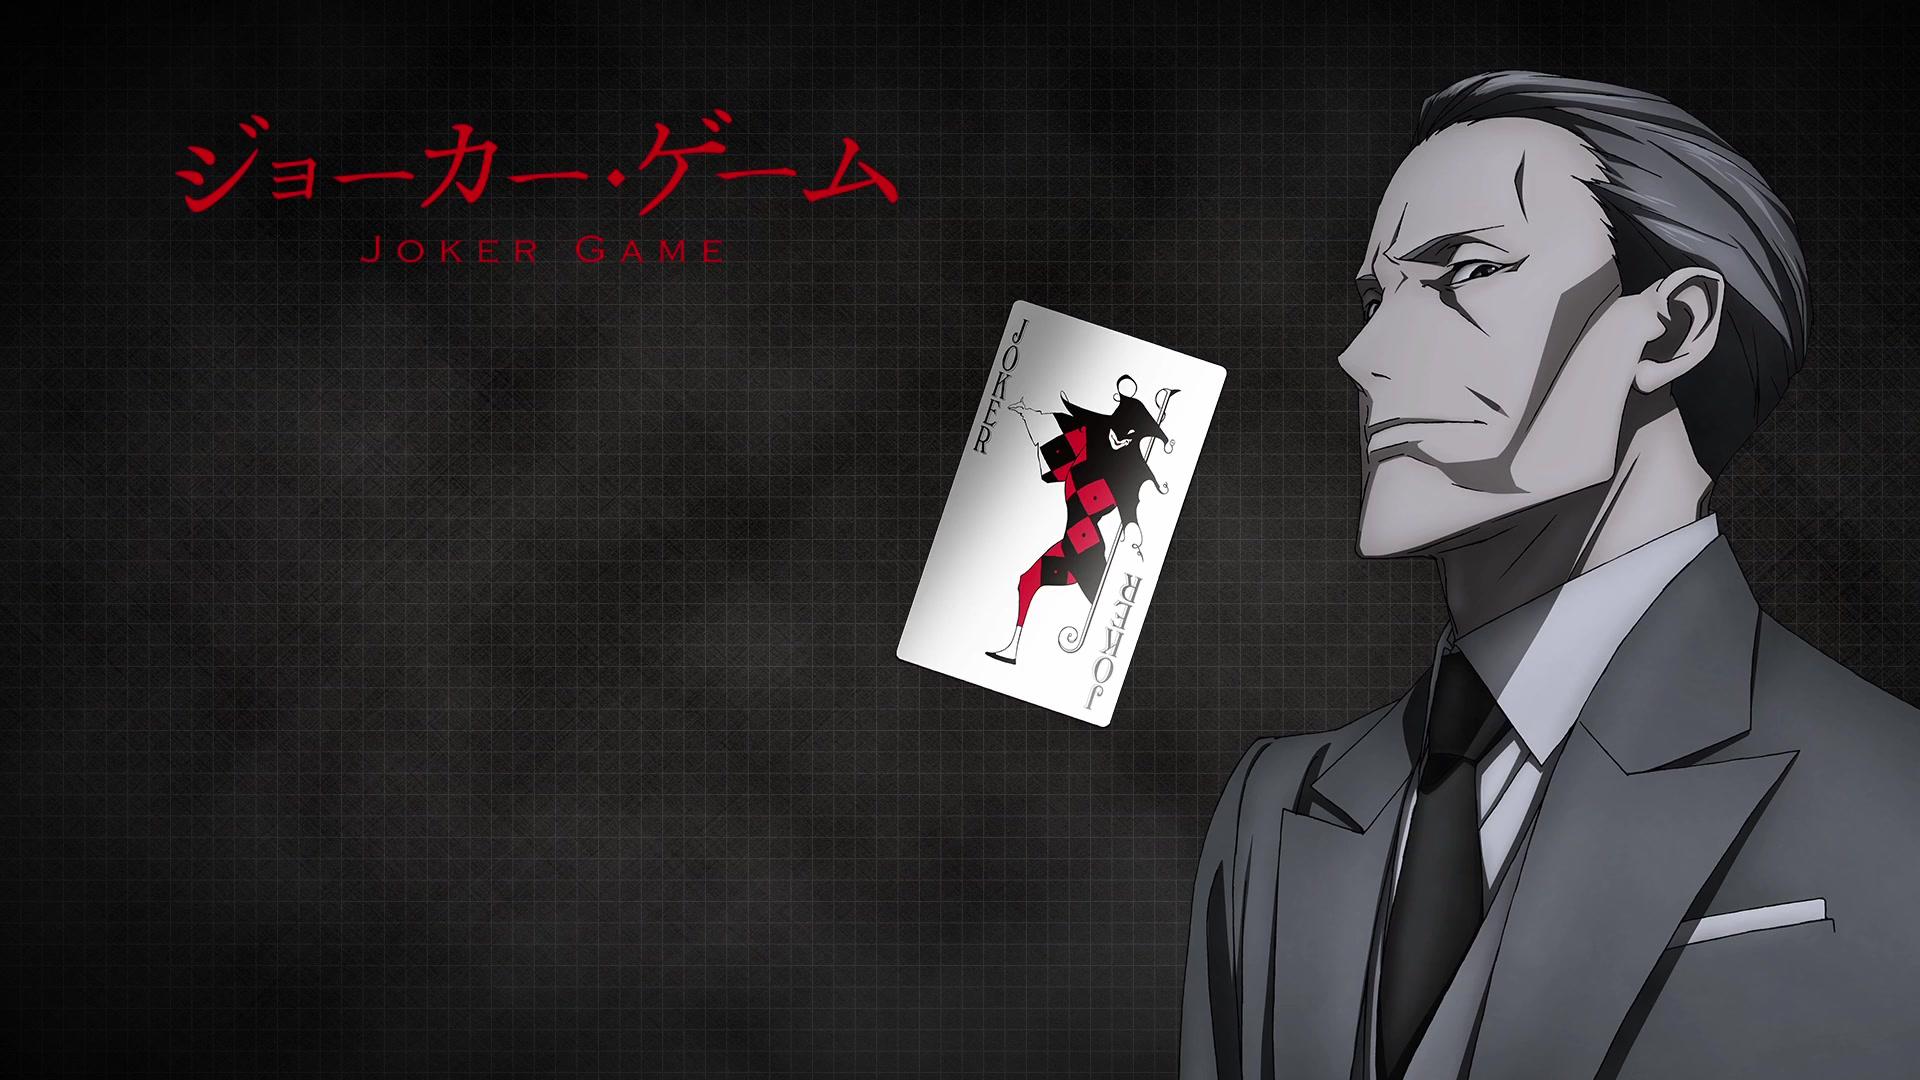 【1080P】JOKER GAME SP【生肉】_嗶哩嗶哩 (゜-゜)つロ 干杯~-bilibili